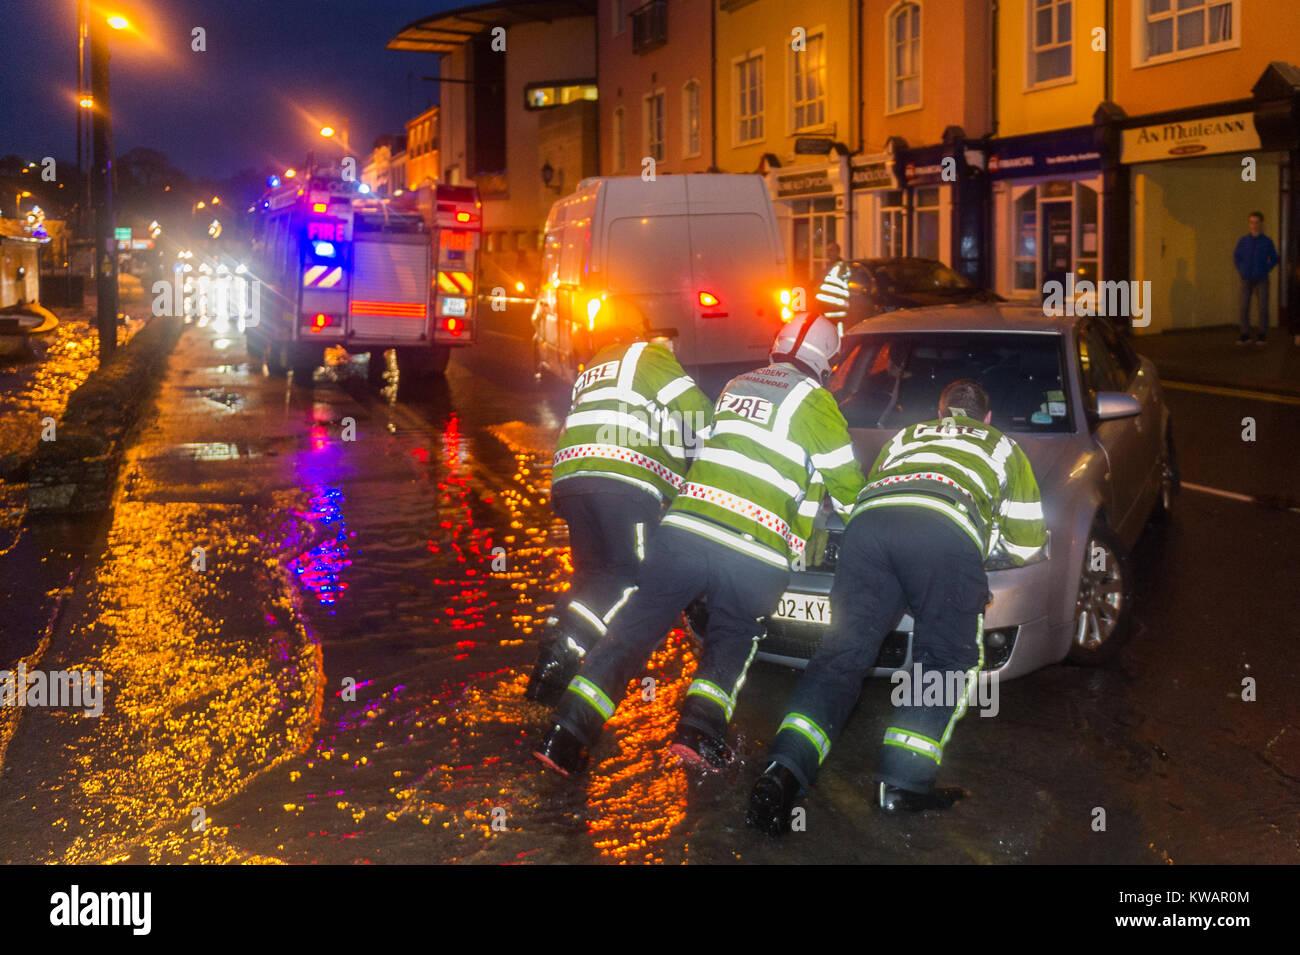 bantry-ireland-2nd-jan-2018-storm-eleano